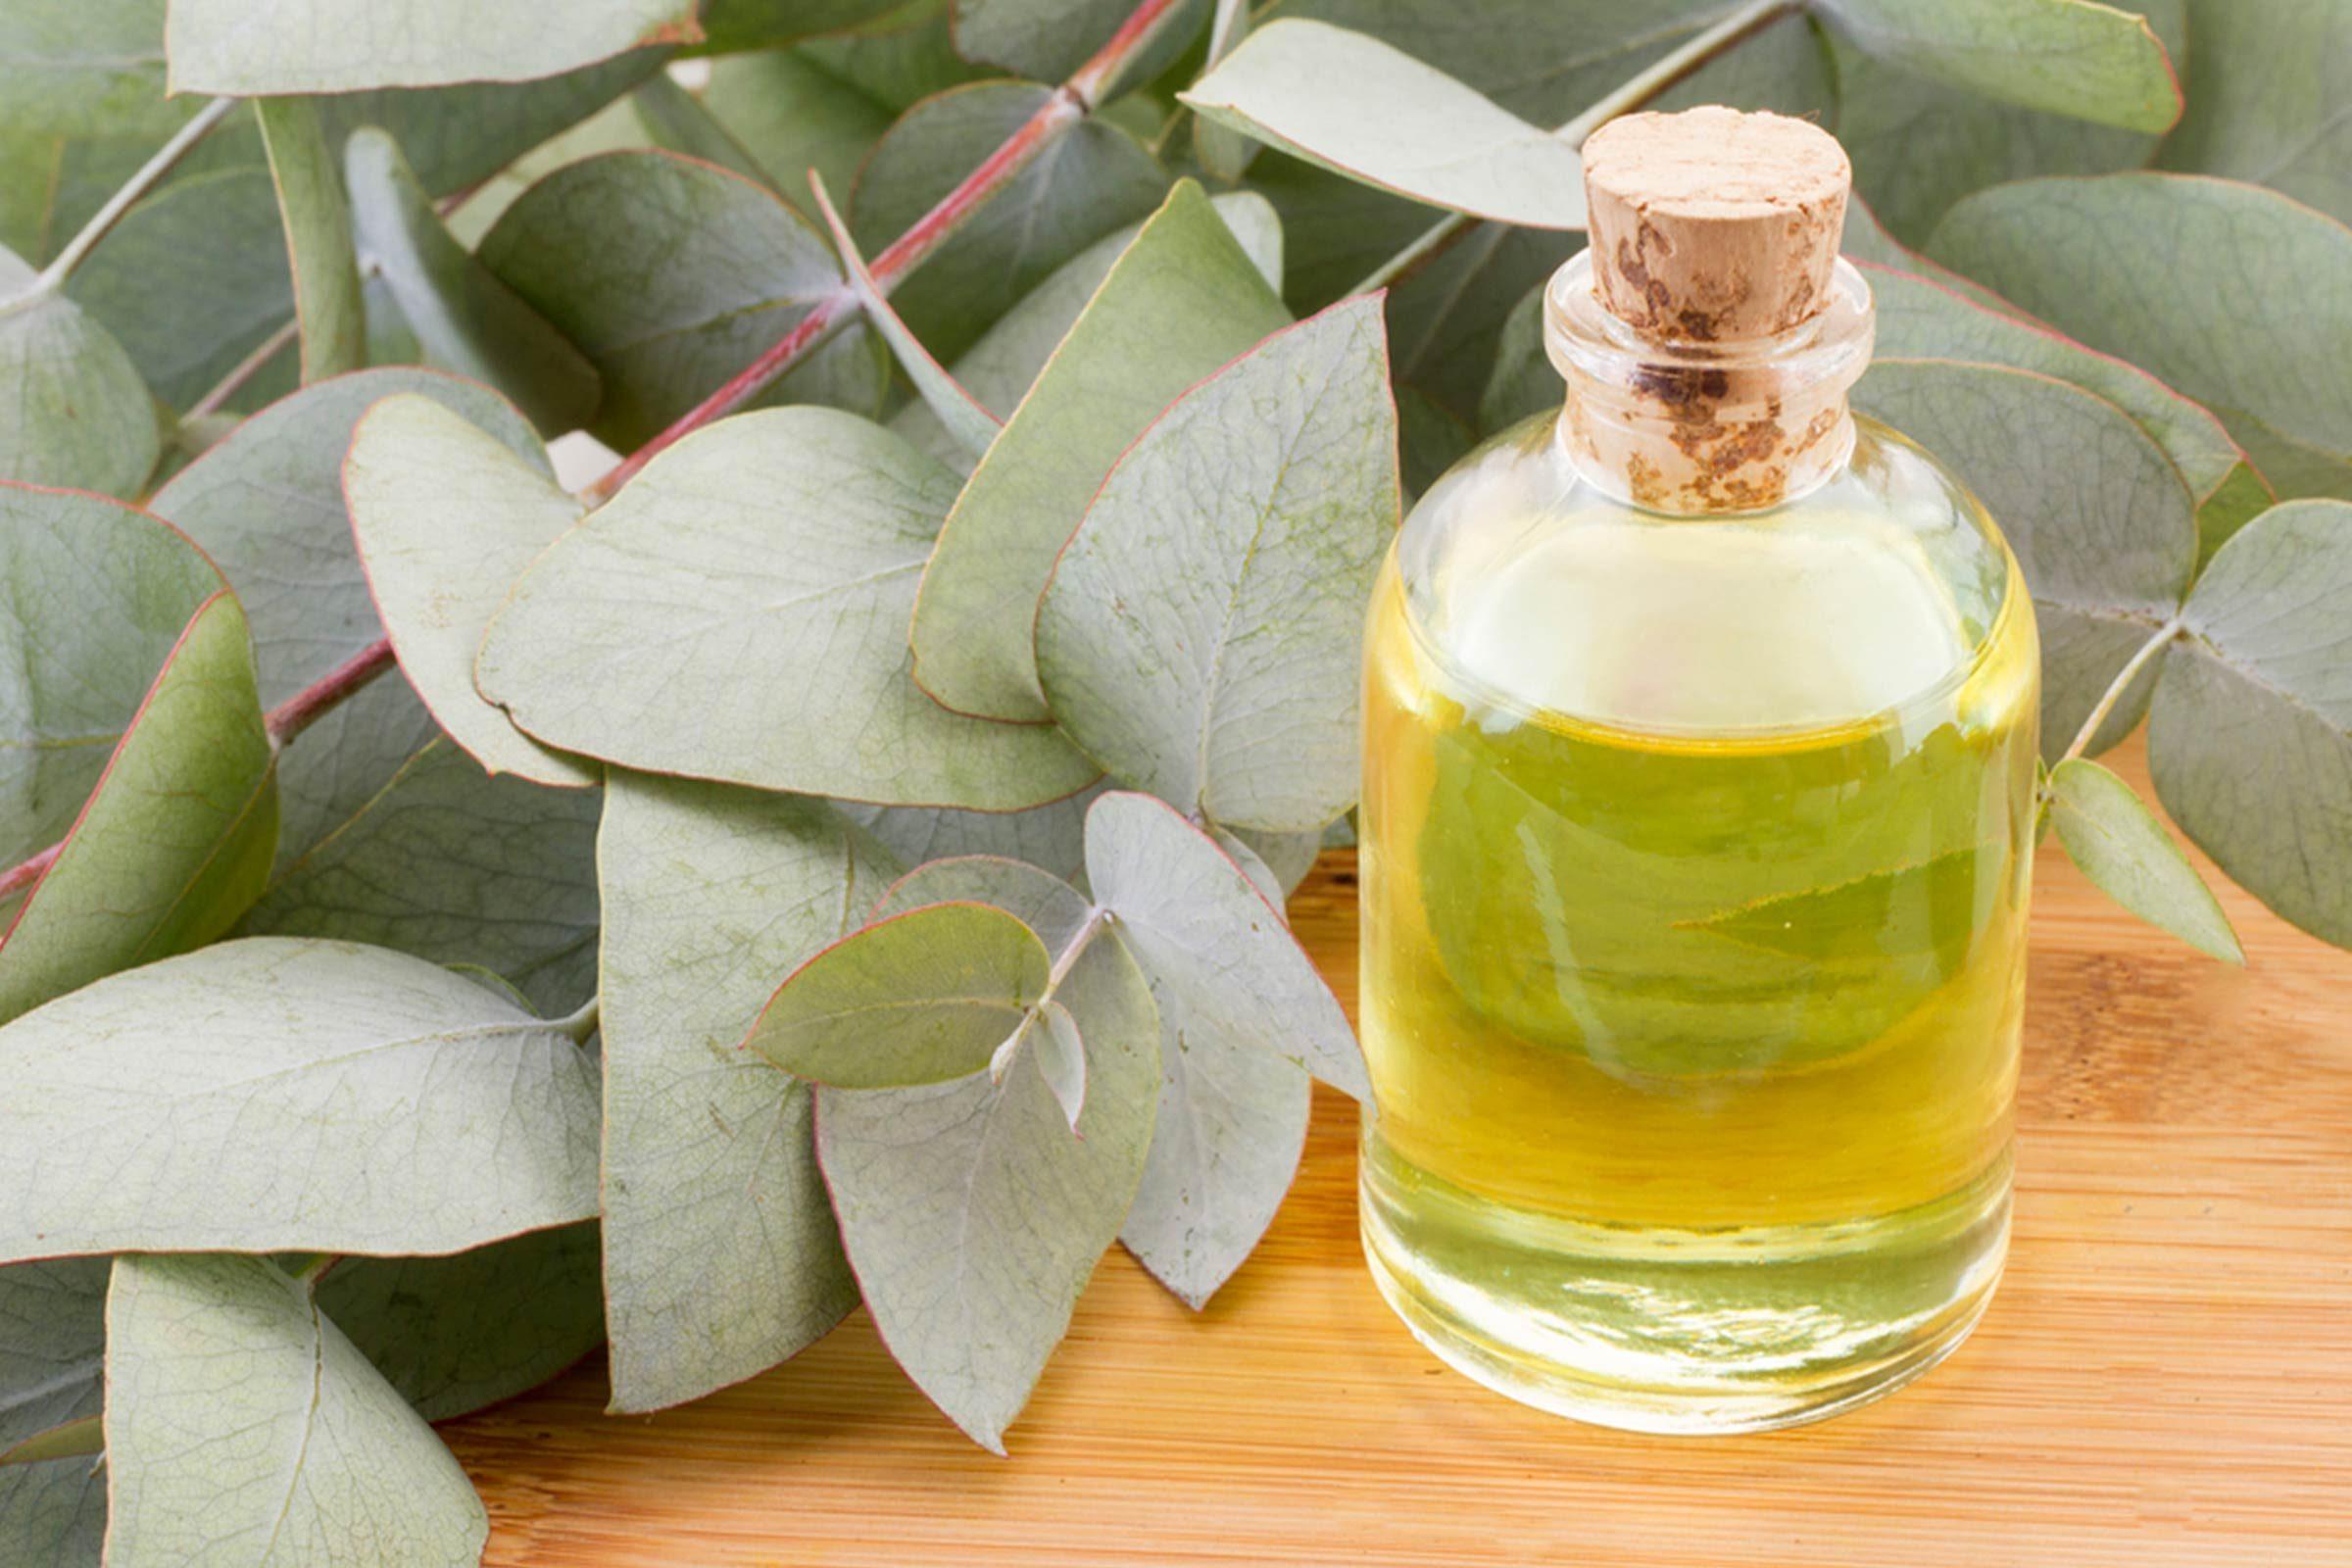 Huiles essentielles: Eucalyptus guérira le rhume et la grippe